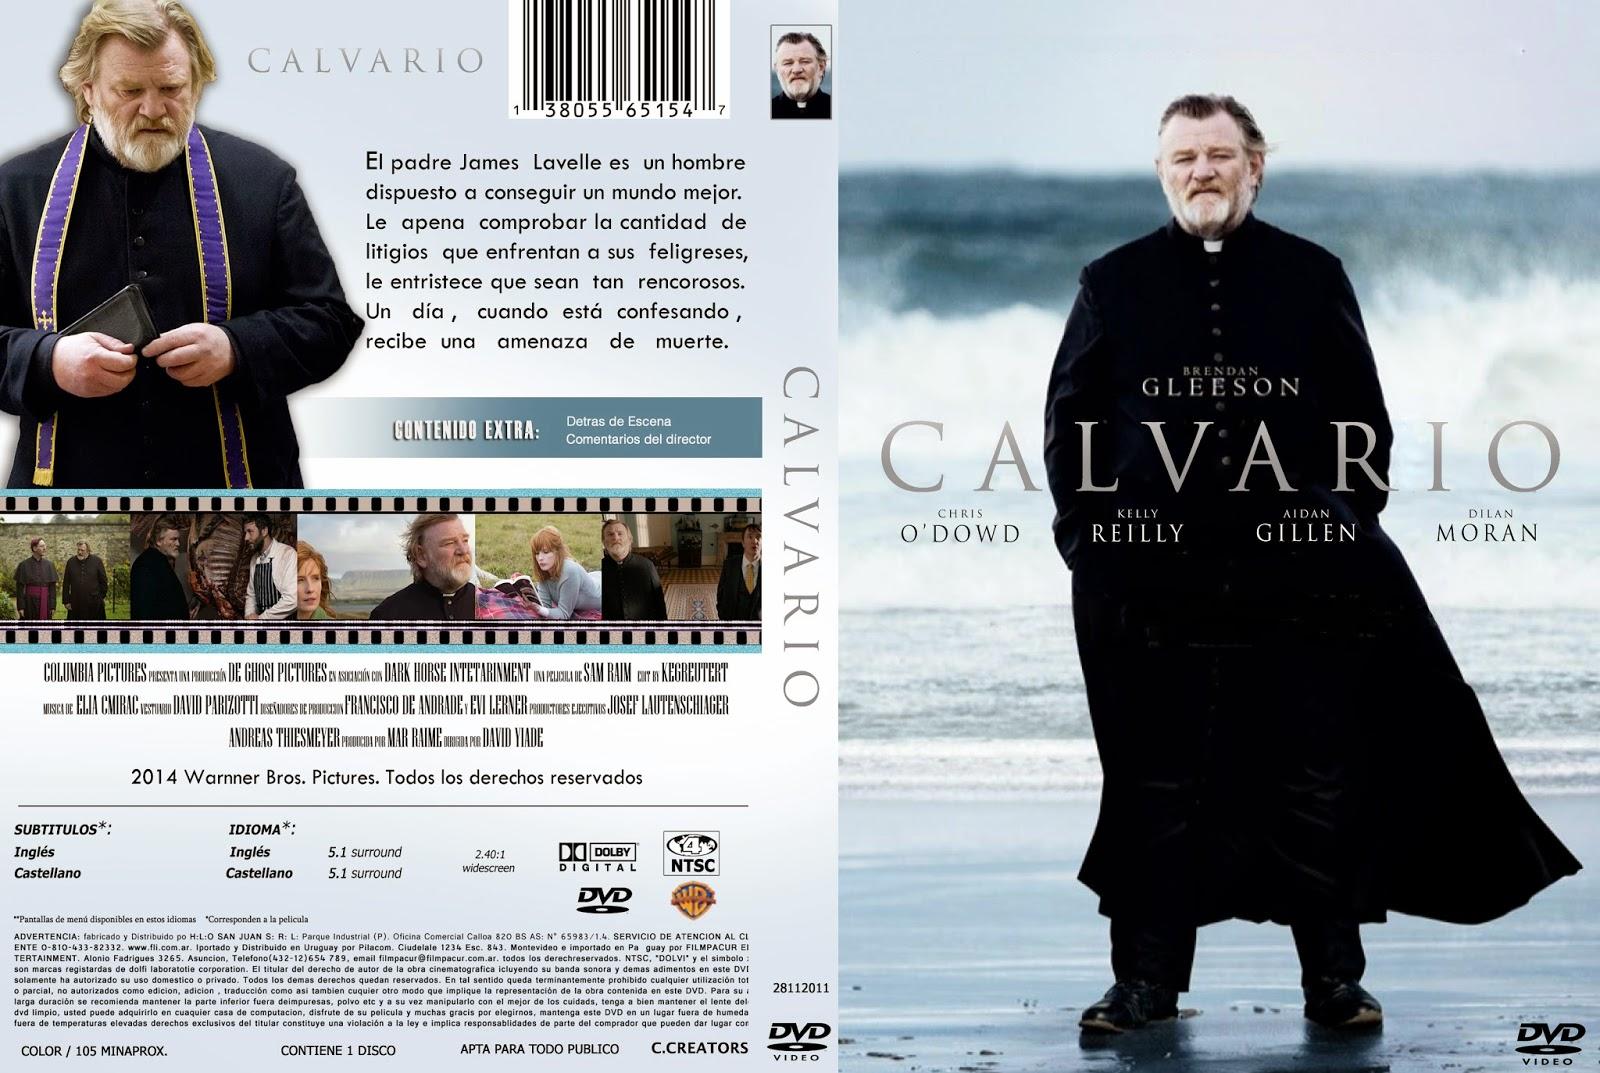 Calvário BDRip XviD Dual Áudio CALVARIO 2Bcovercreators